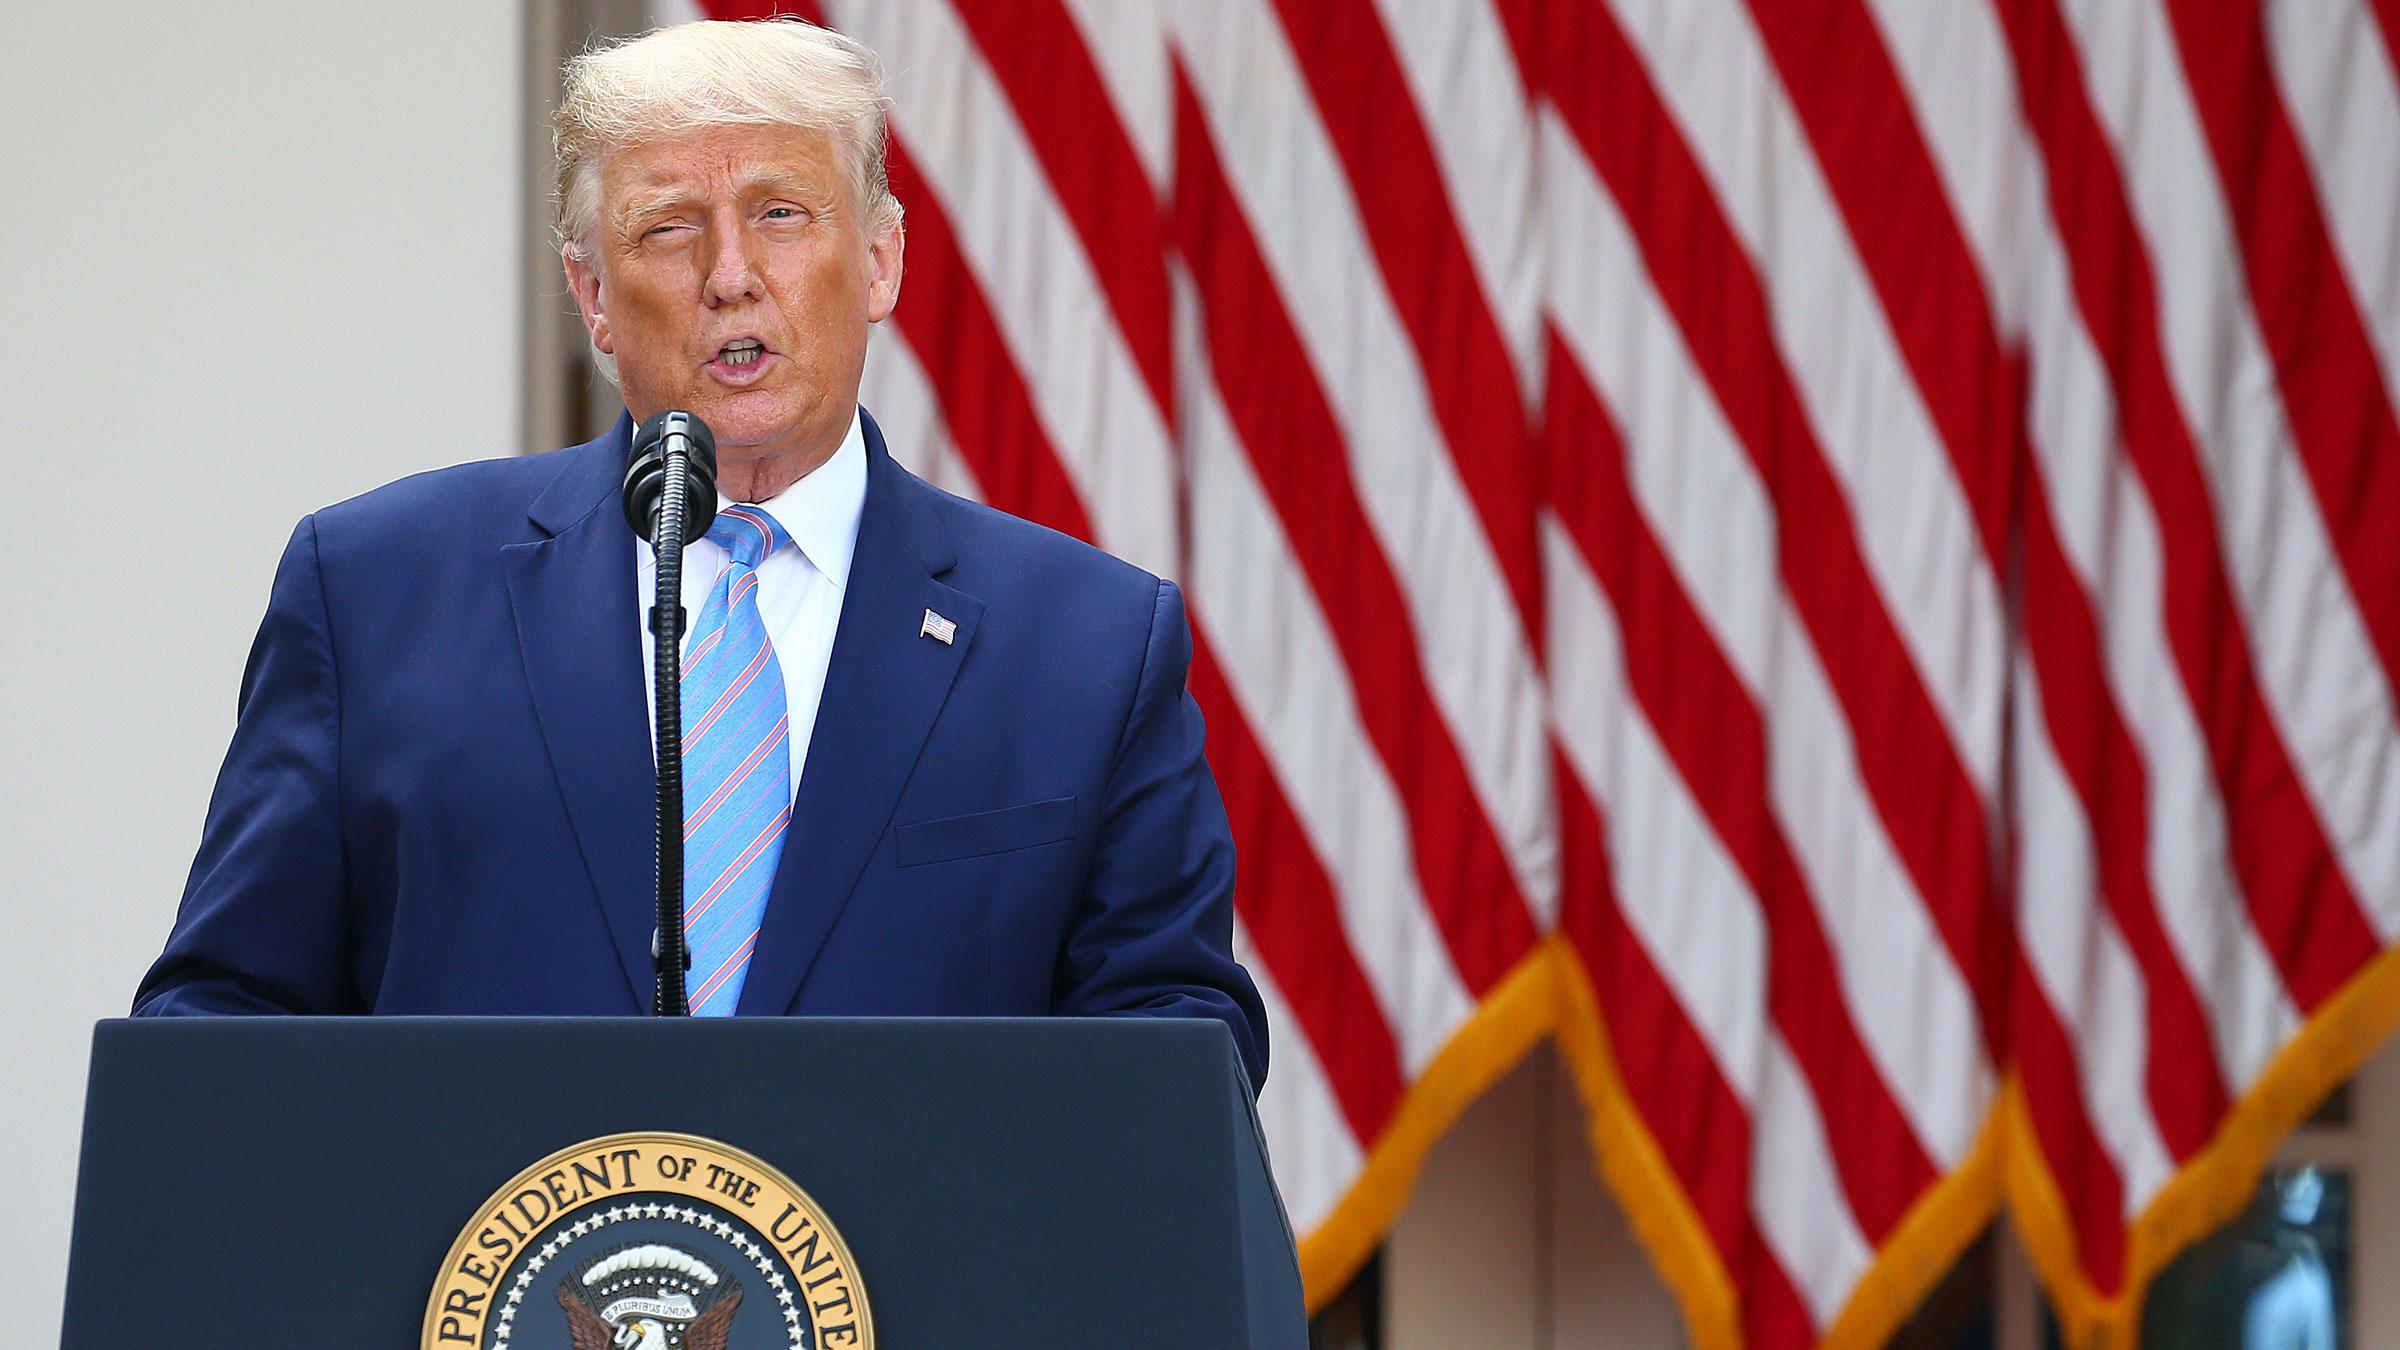 President Donald Trump speaks from the White House Rose Garden on Monday.